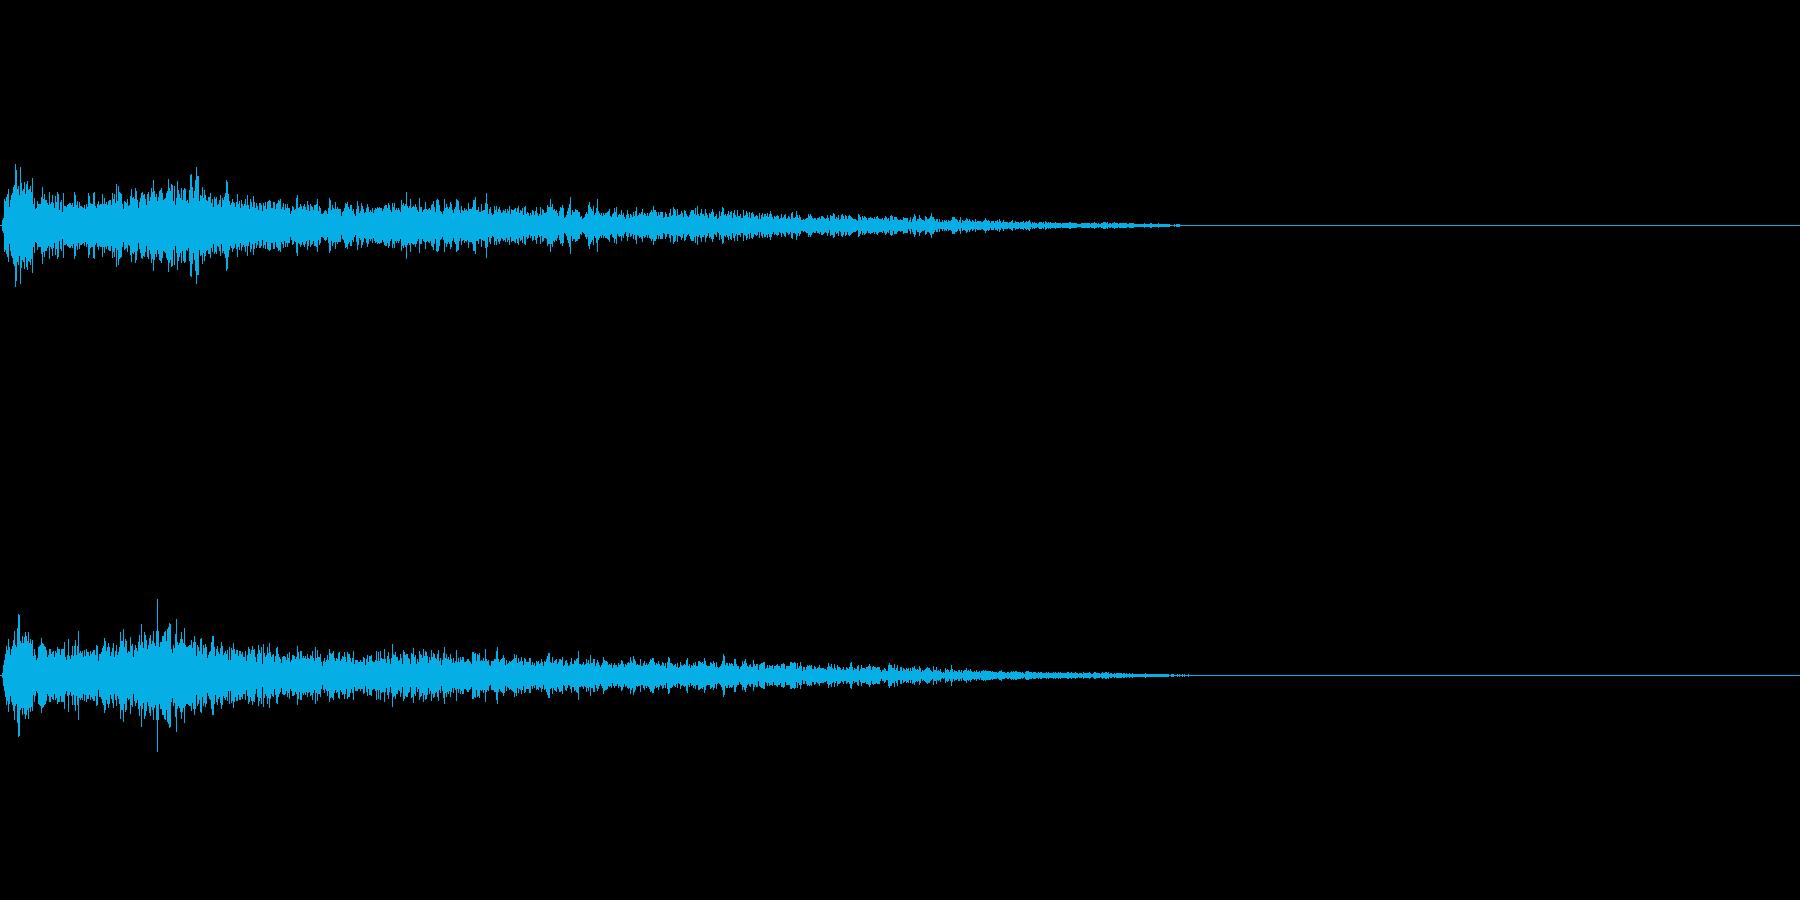 Cマイナー インパクト音 衝撃音の再生済みの波形